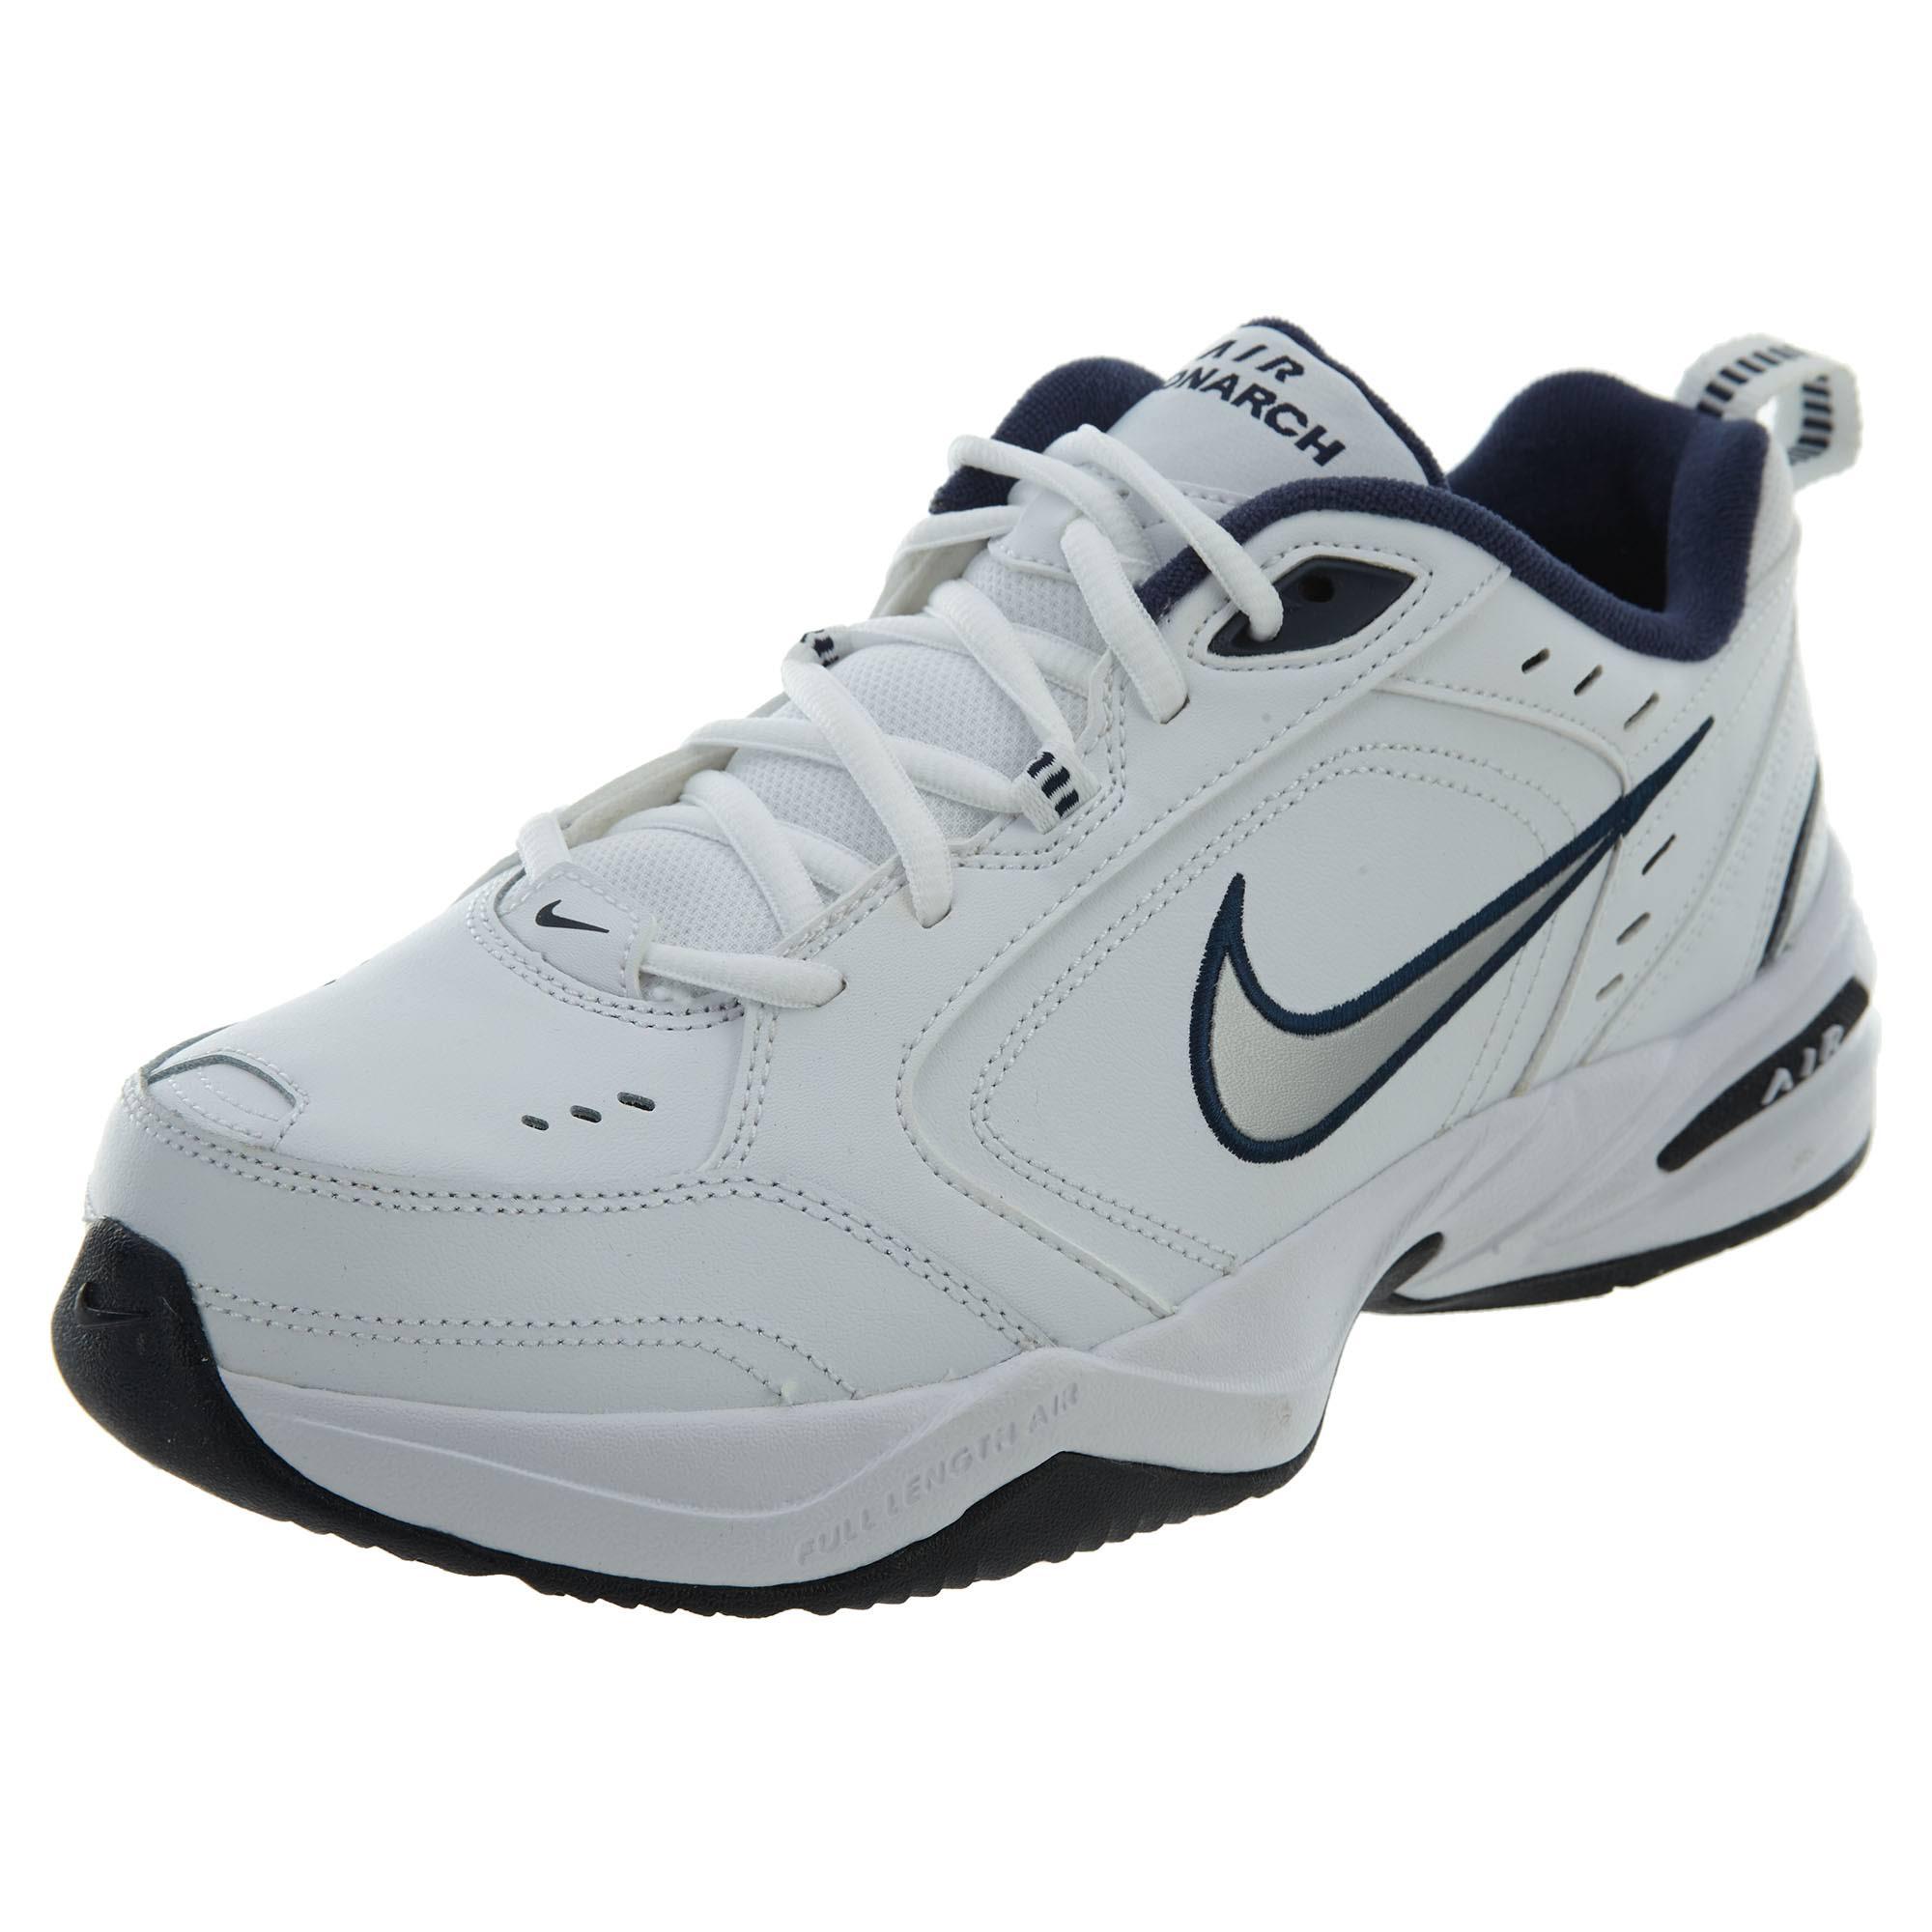 5 Nike Iv Herrenschuhe Monarch 416355102 7 Air Größe 0wg0OnZ6